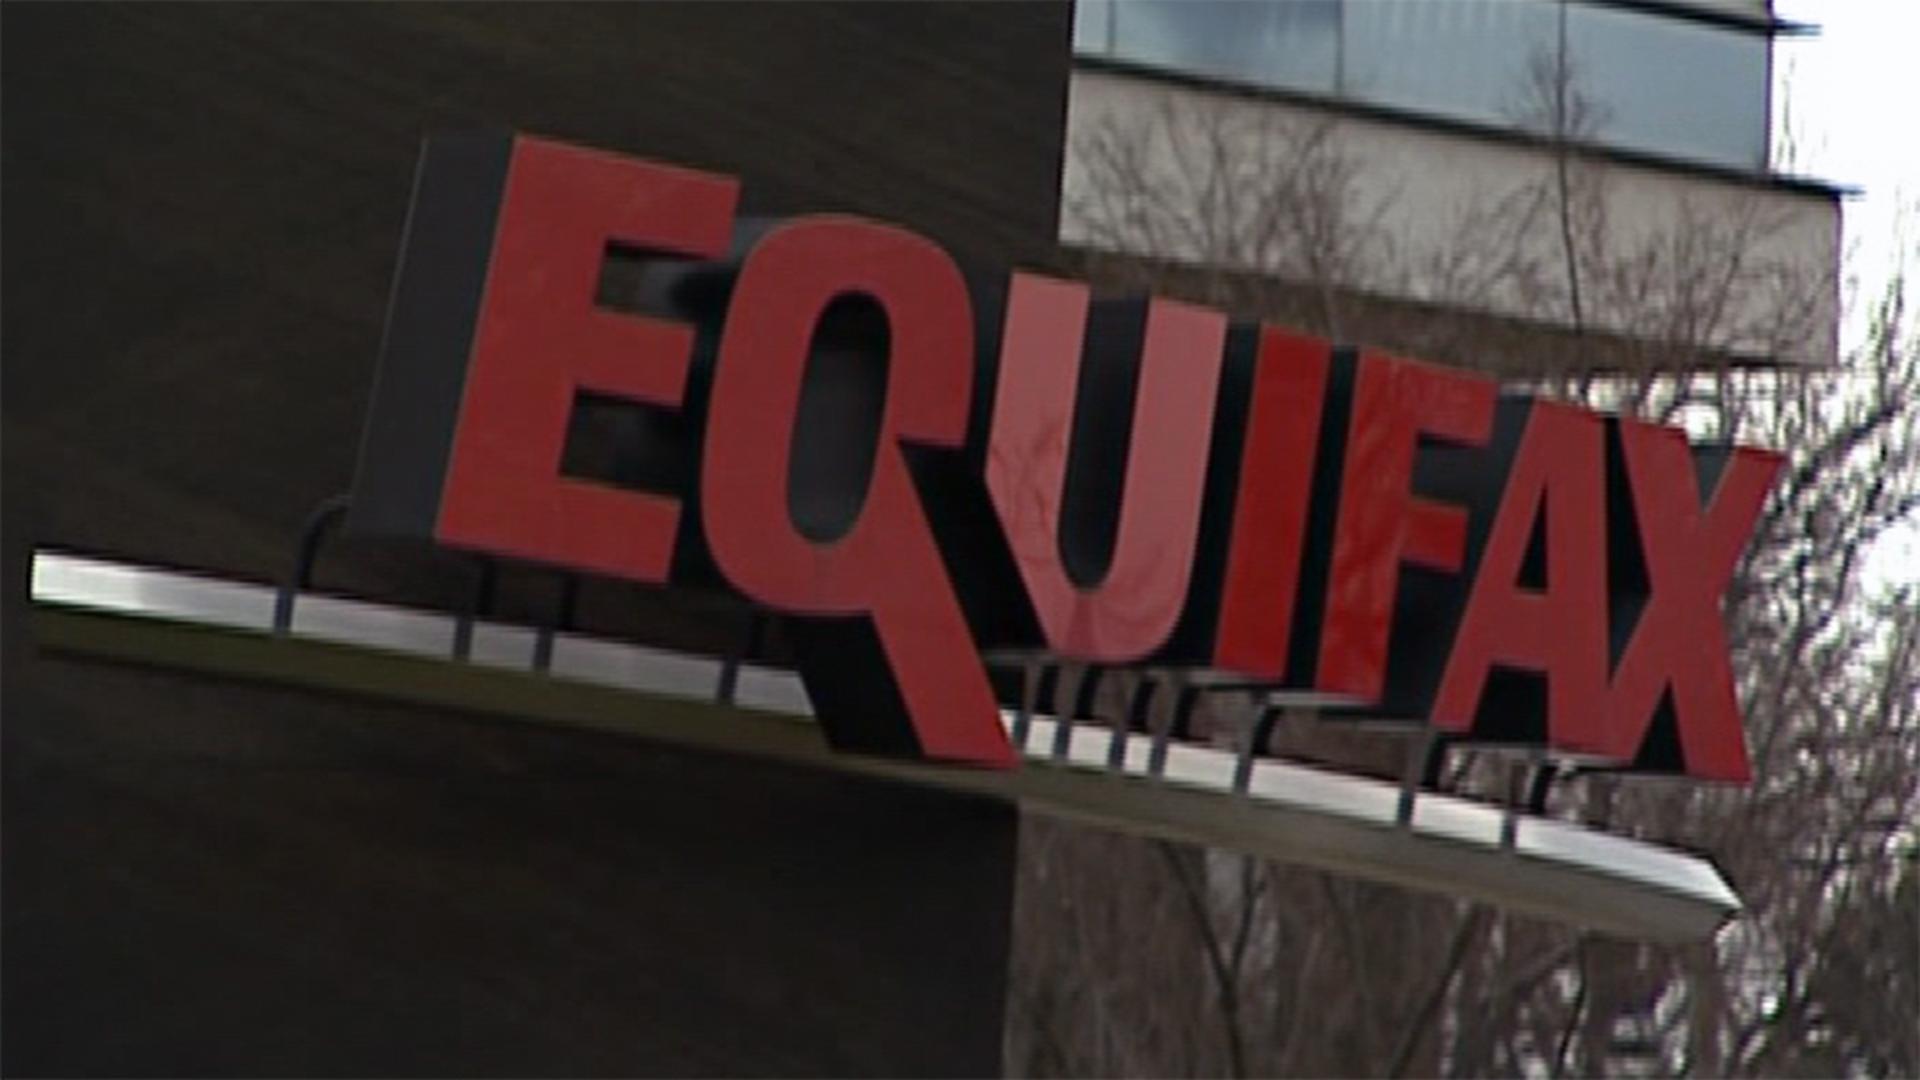 Equifax sign from CNN video-159532.jpg62202436